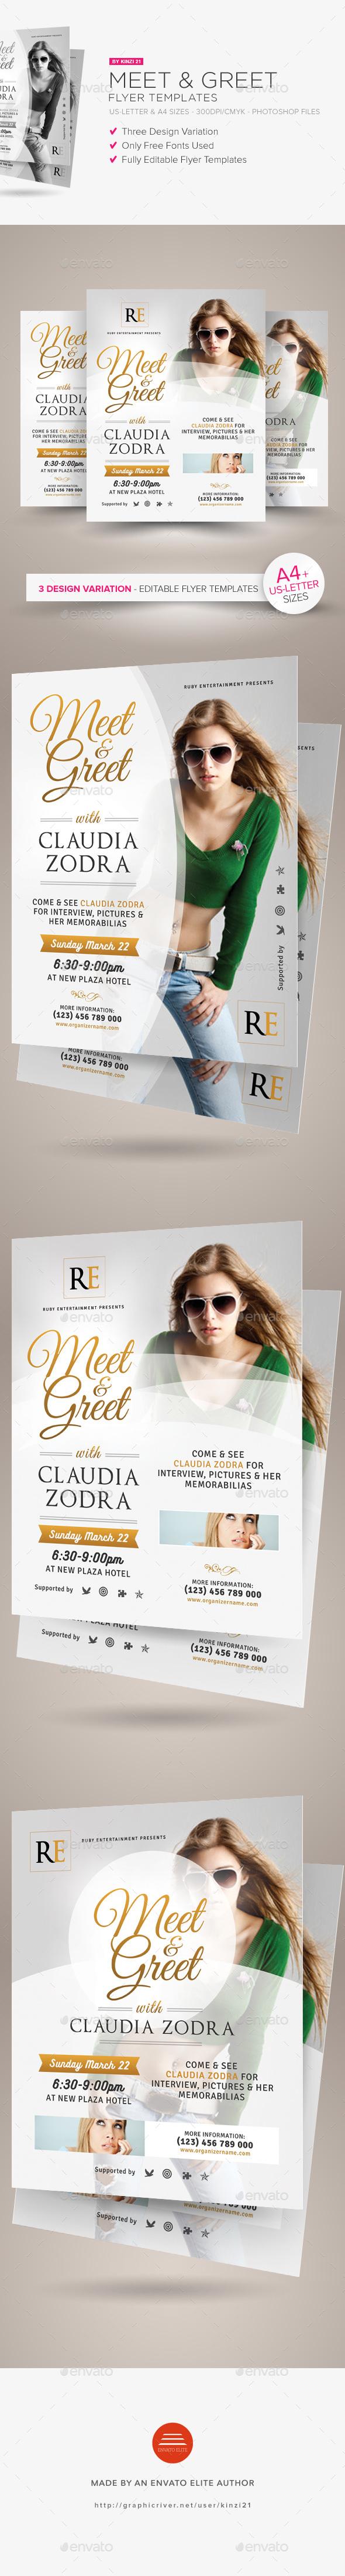 Meet & Greet Flyer Templates - Miscellaneous Events